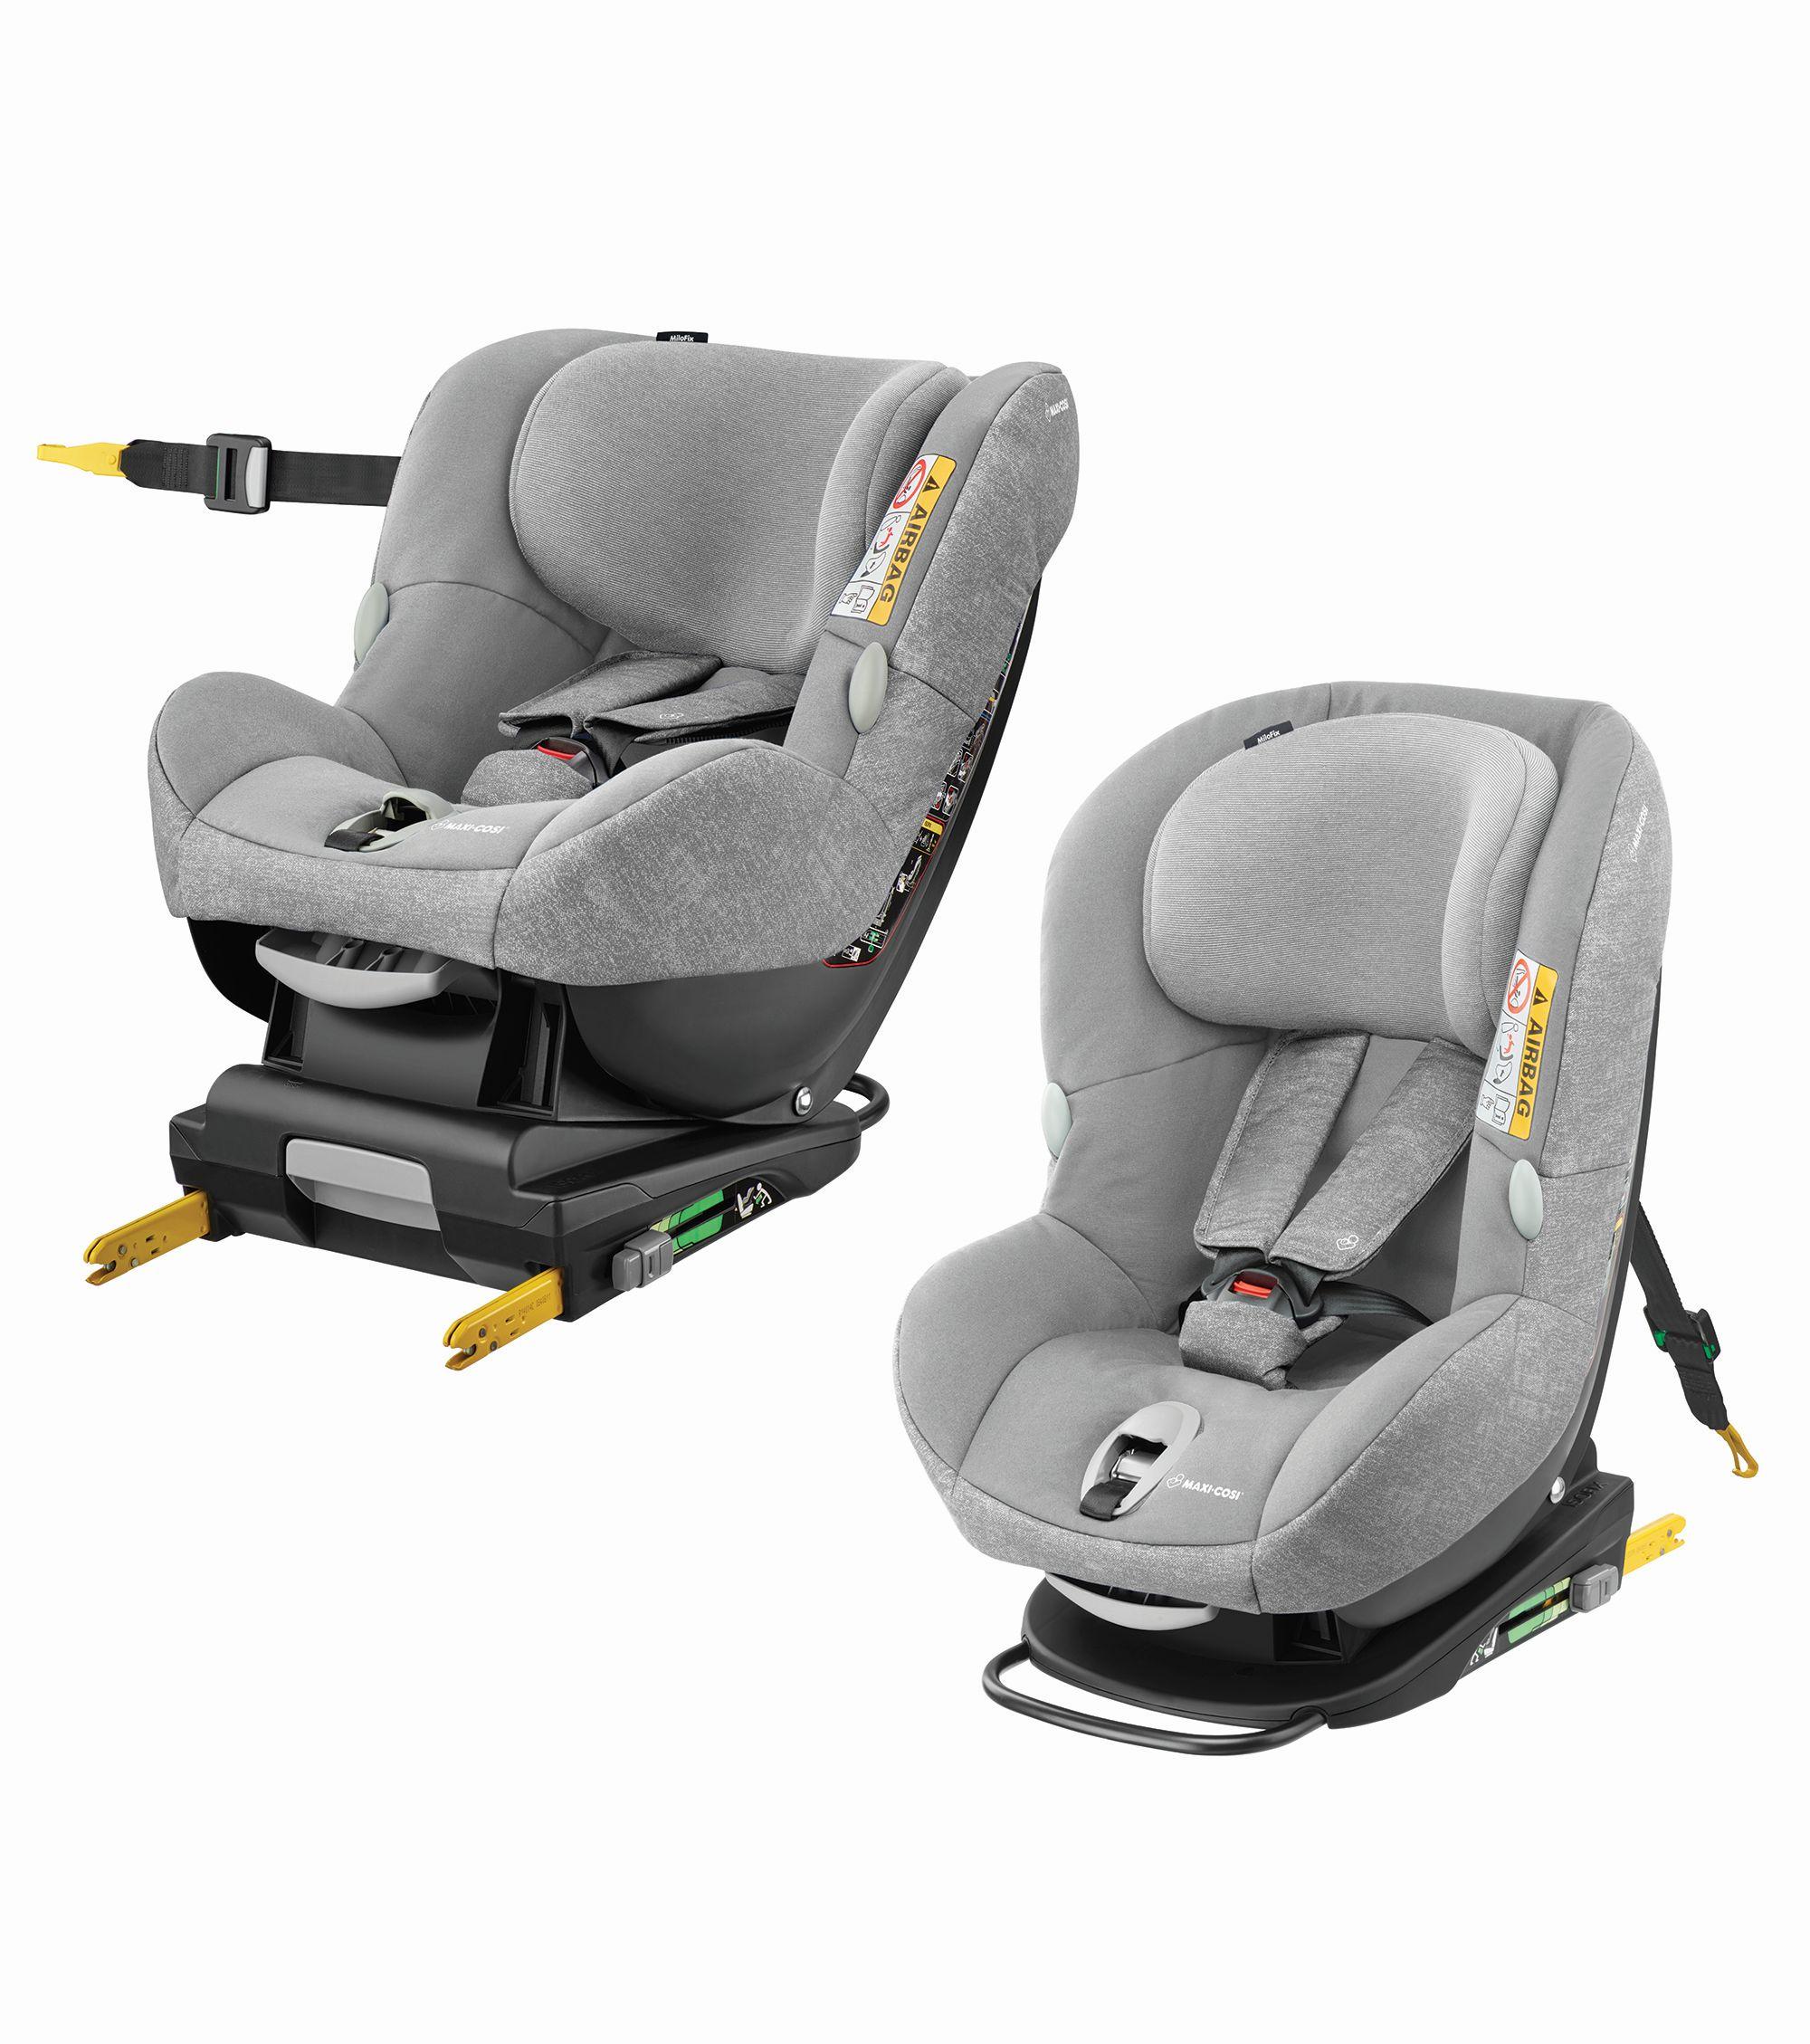 maxi cosi child car seat milofix 2019 nomad grey buy at kidsroom car seats isofix child. Black Bedroom Furniture Sets. Home Design Ideas